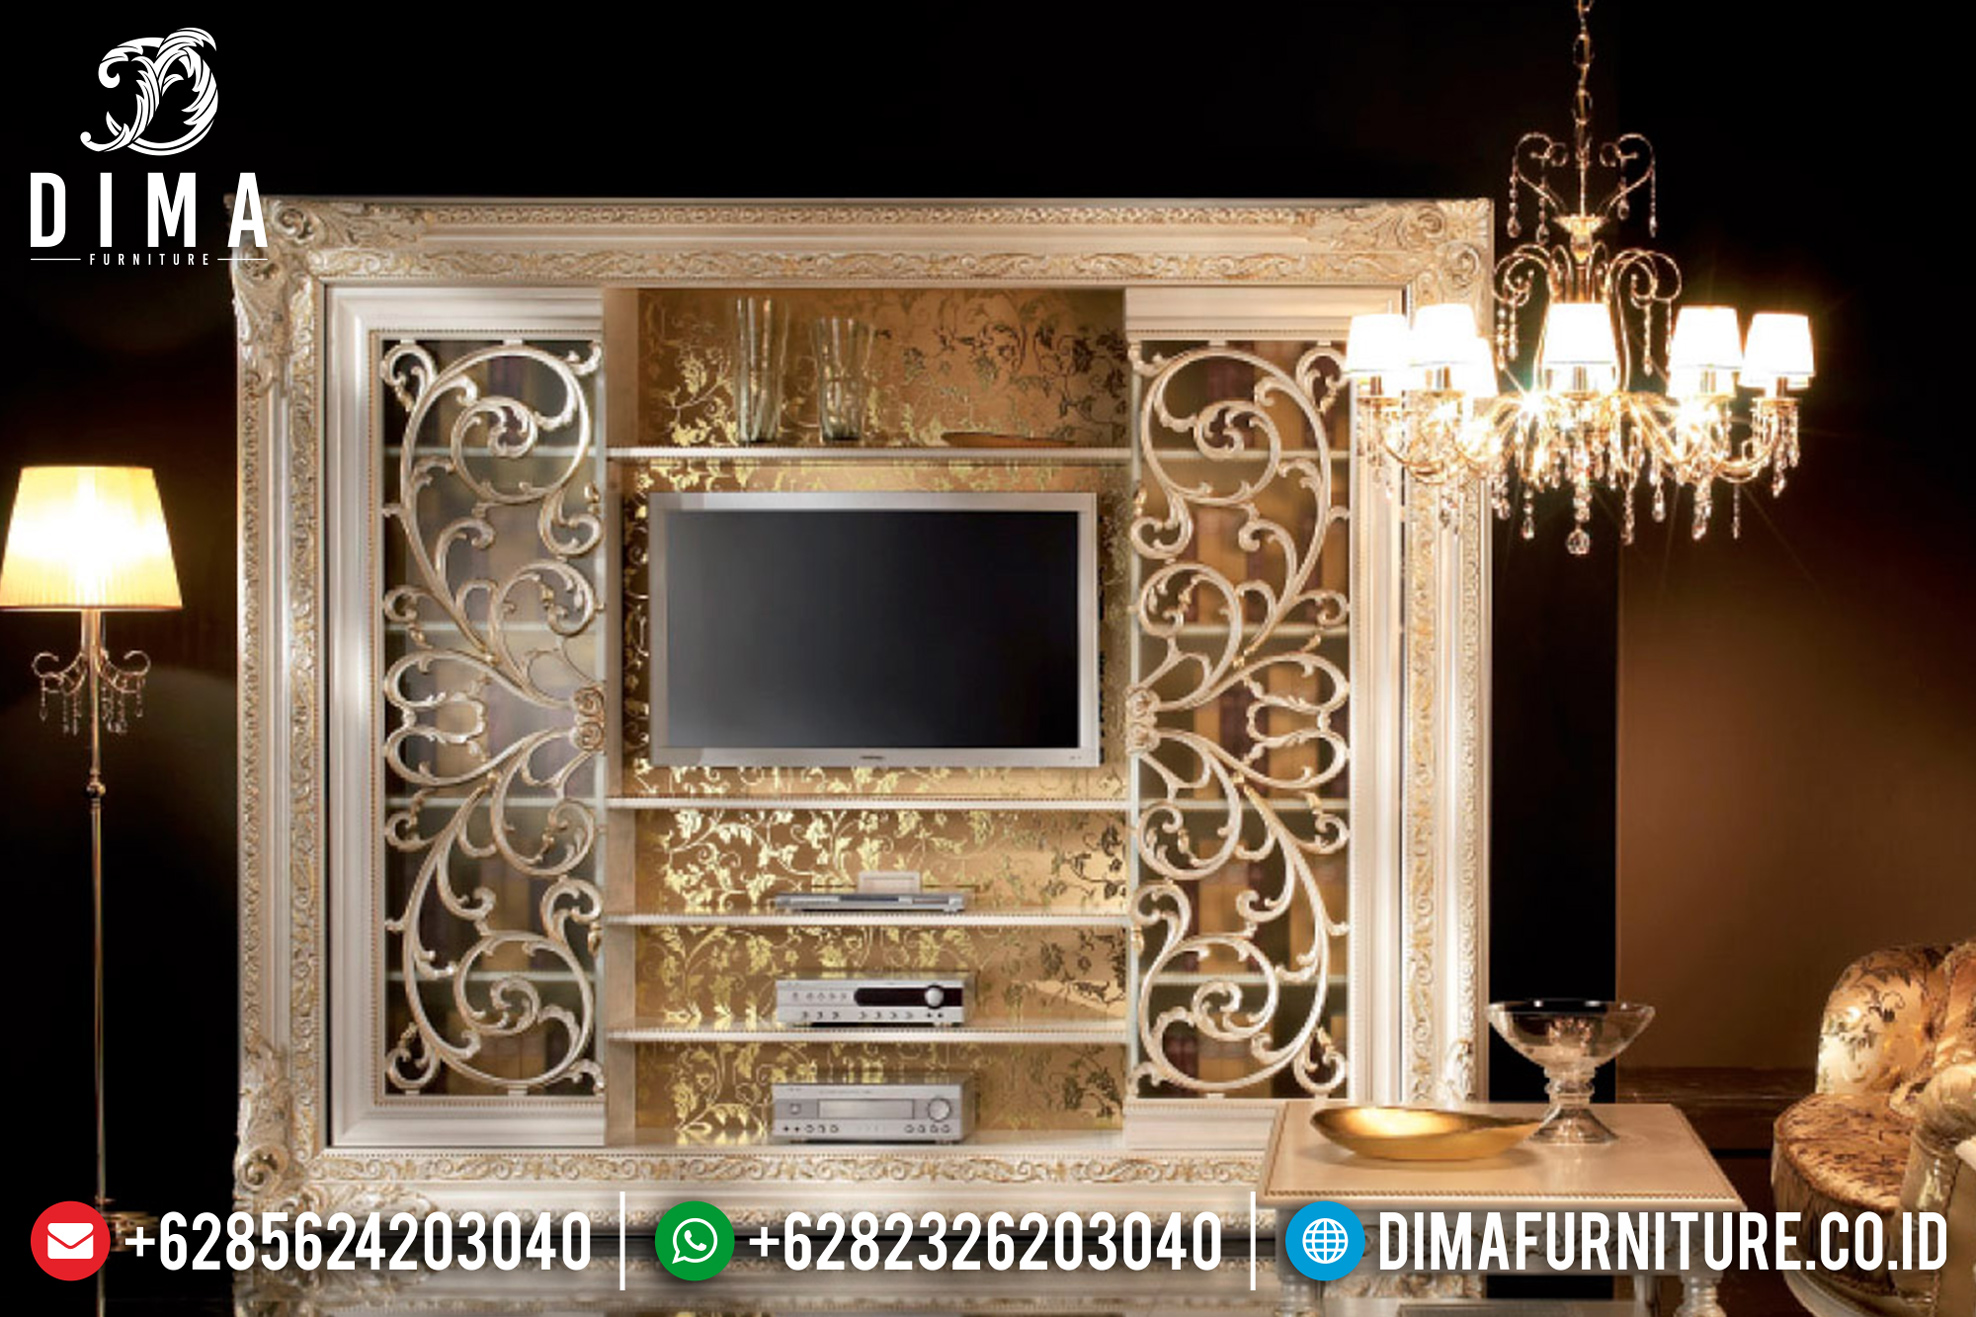 Set Bufet Tv Klasik Ukiran Mebel Jepara Mewah Terbaru MM-0552